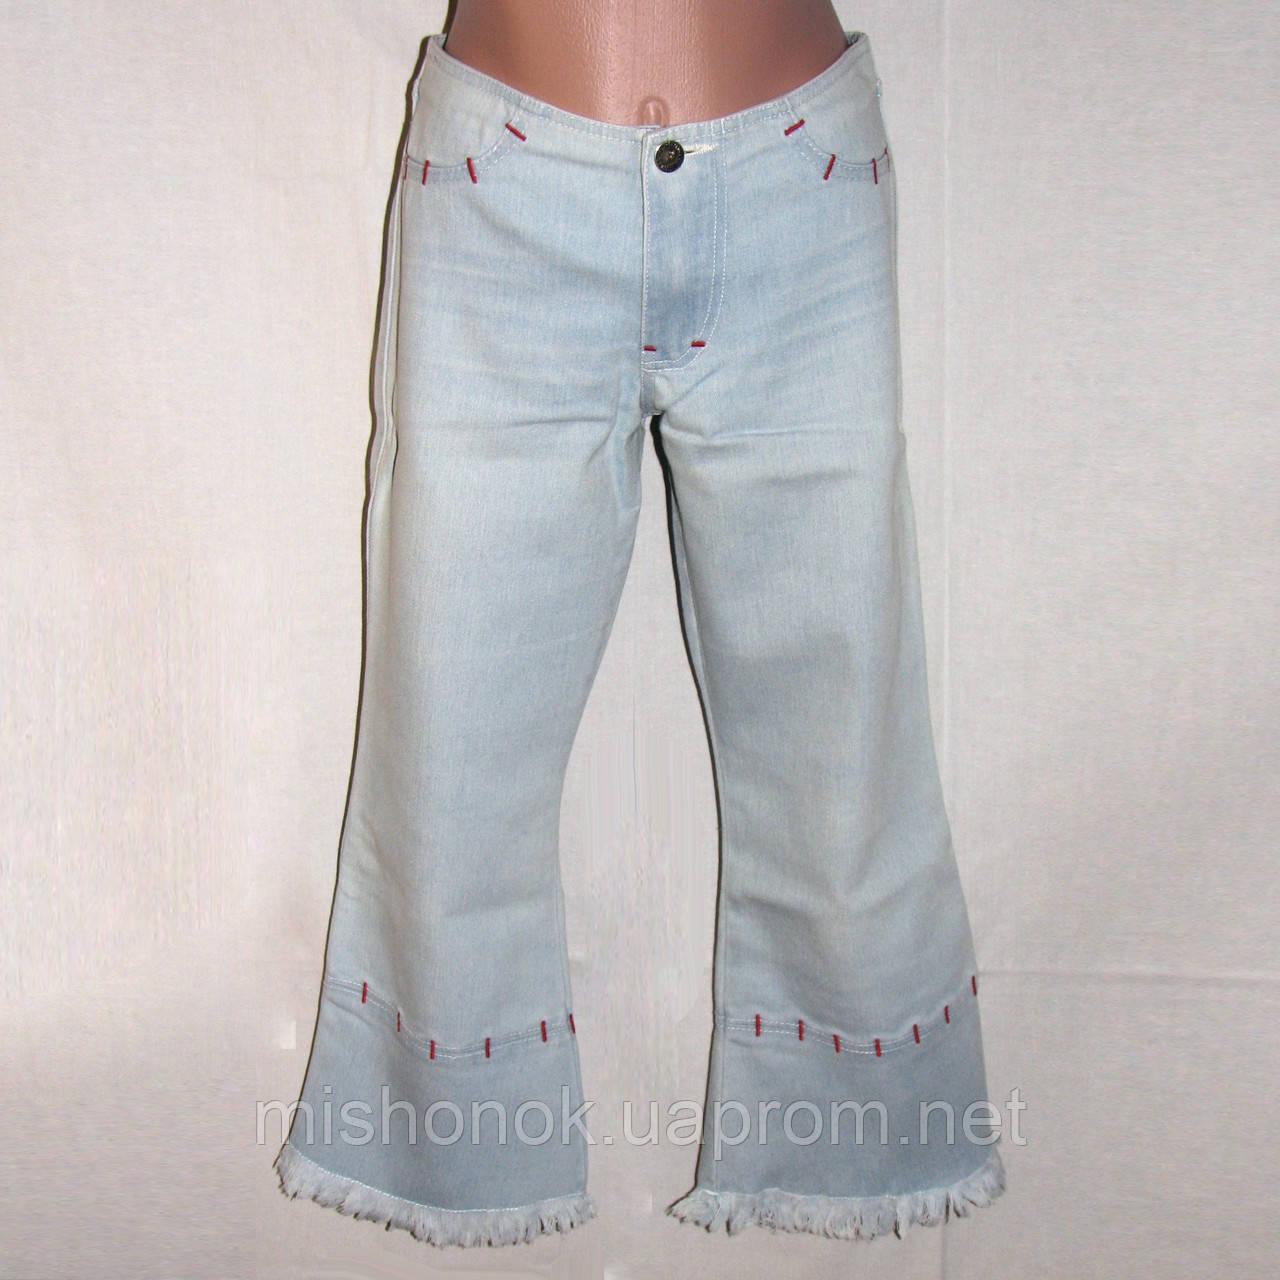 07387e30b02 Женские джинсовые капри